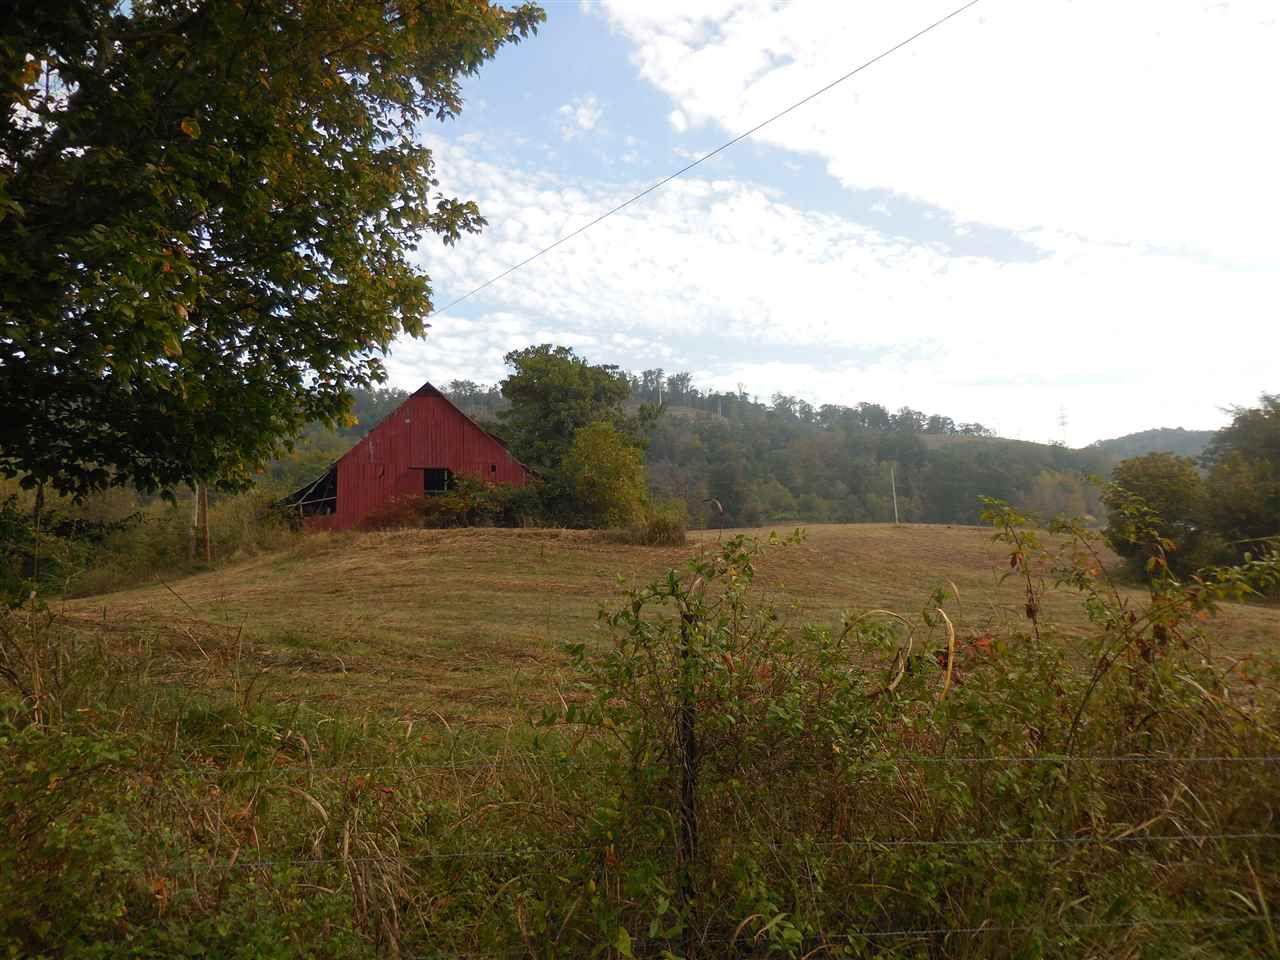 48 Acres Repass Road Parcel #057-02 For Sale - Bulls Gap, TN   Trulia